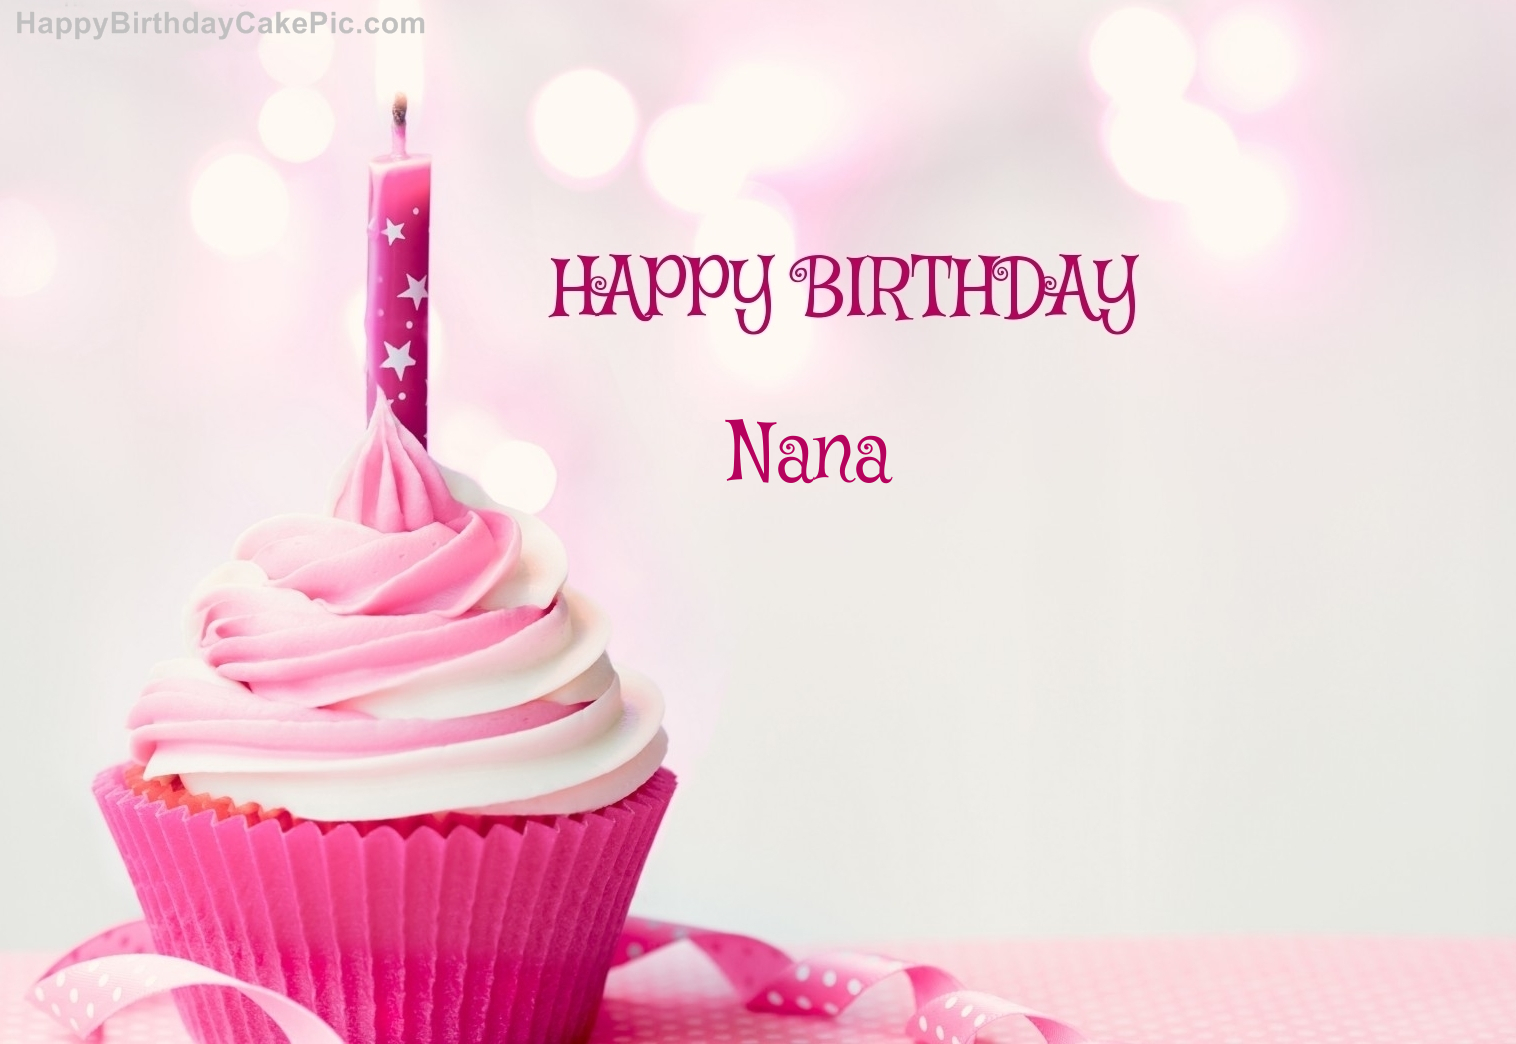 Happy Birthday Cupcake Candle Pink Cake For Nana